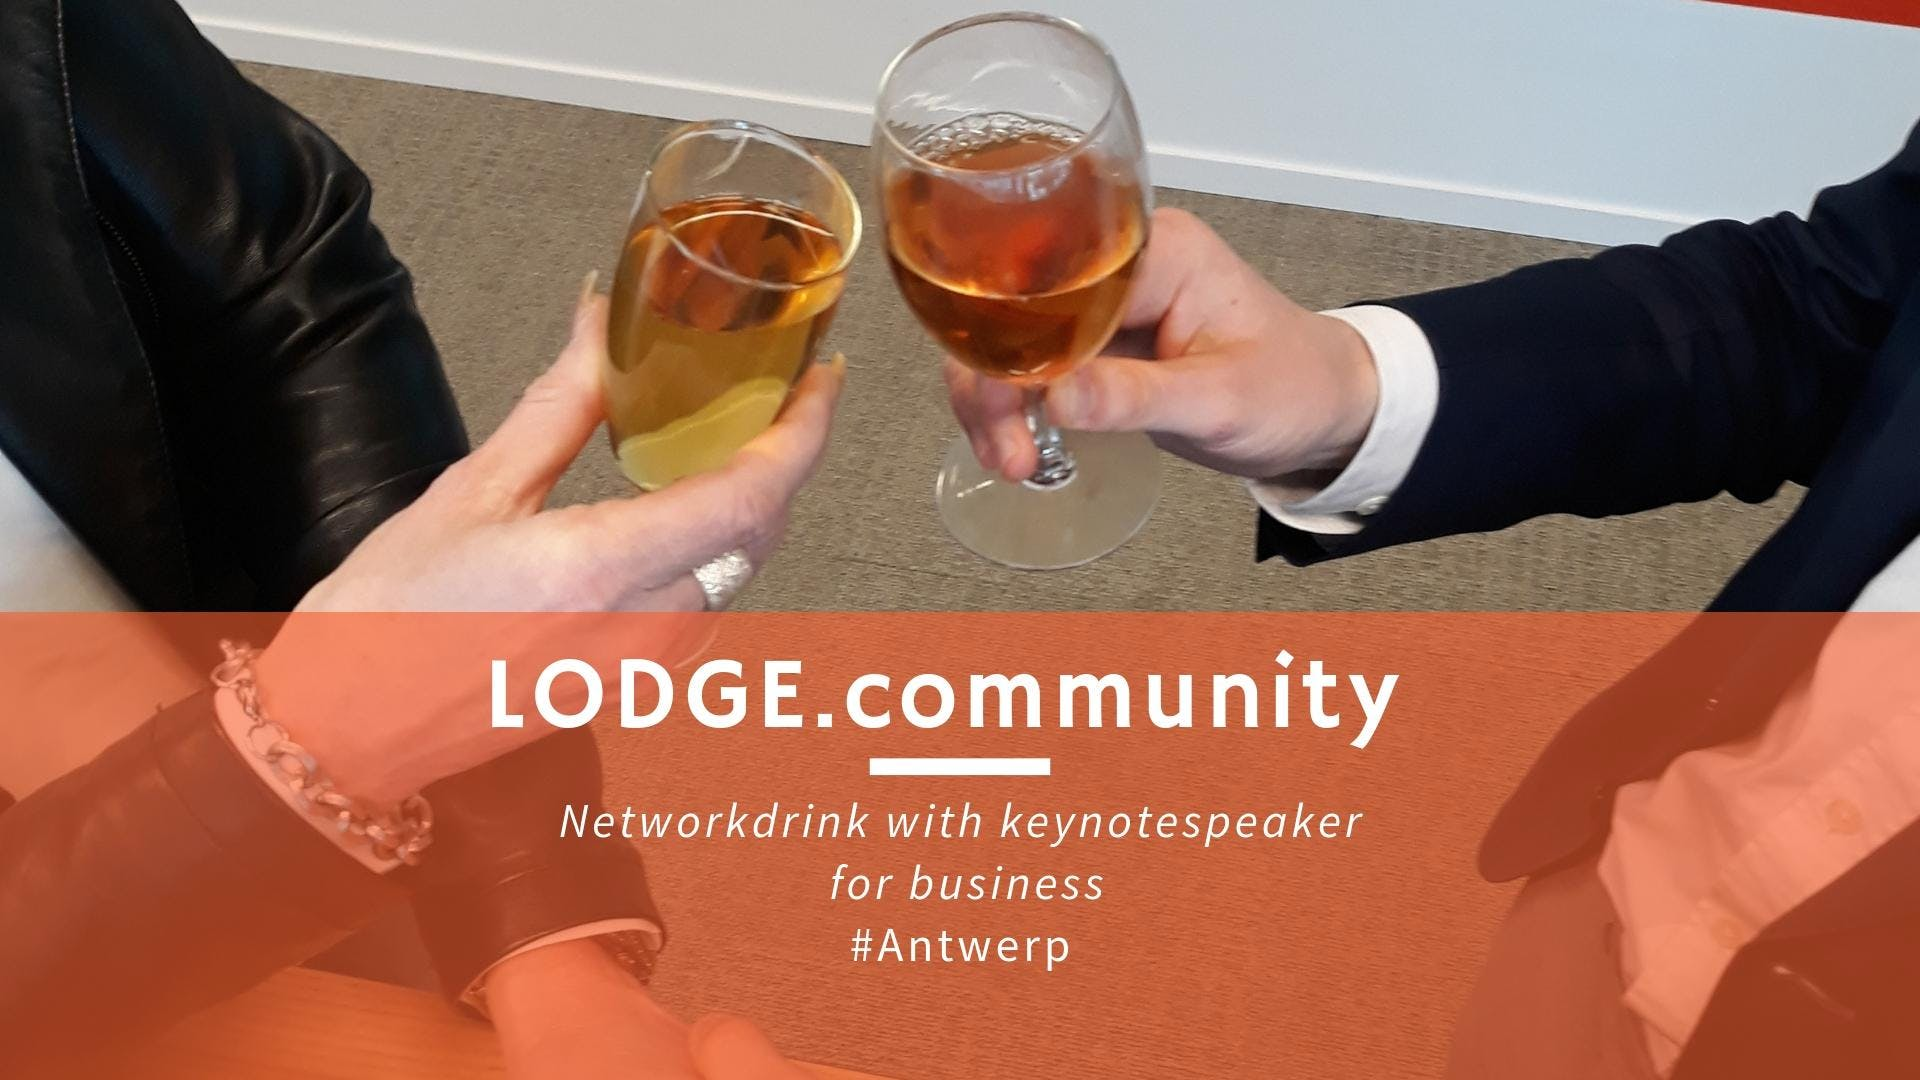 LODGE.community